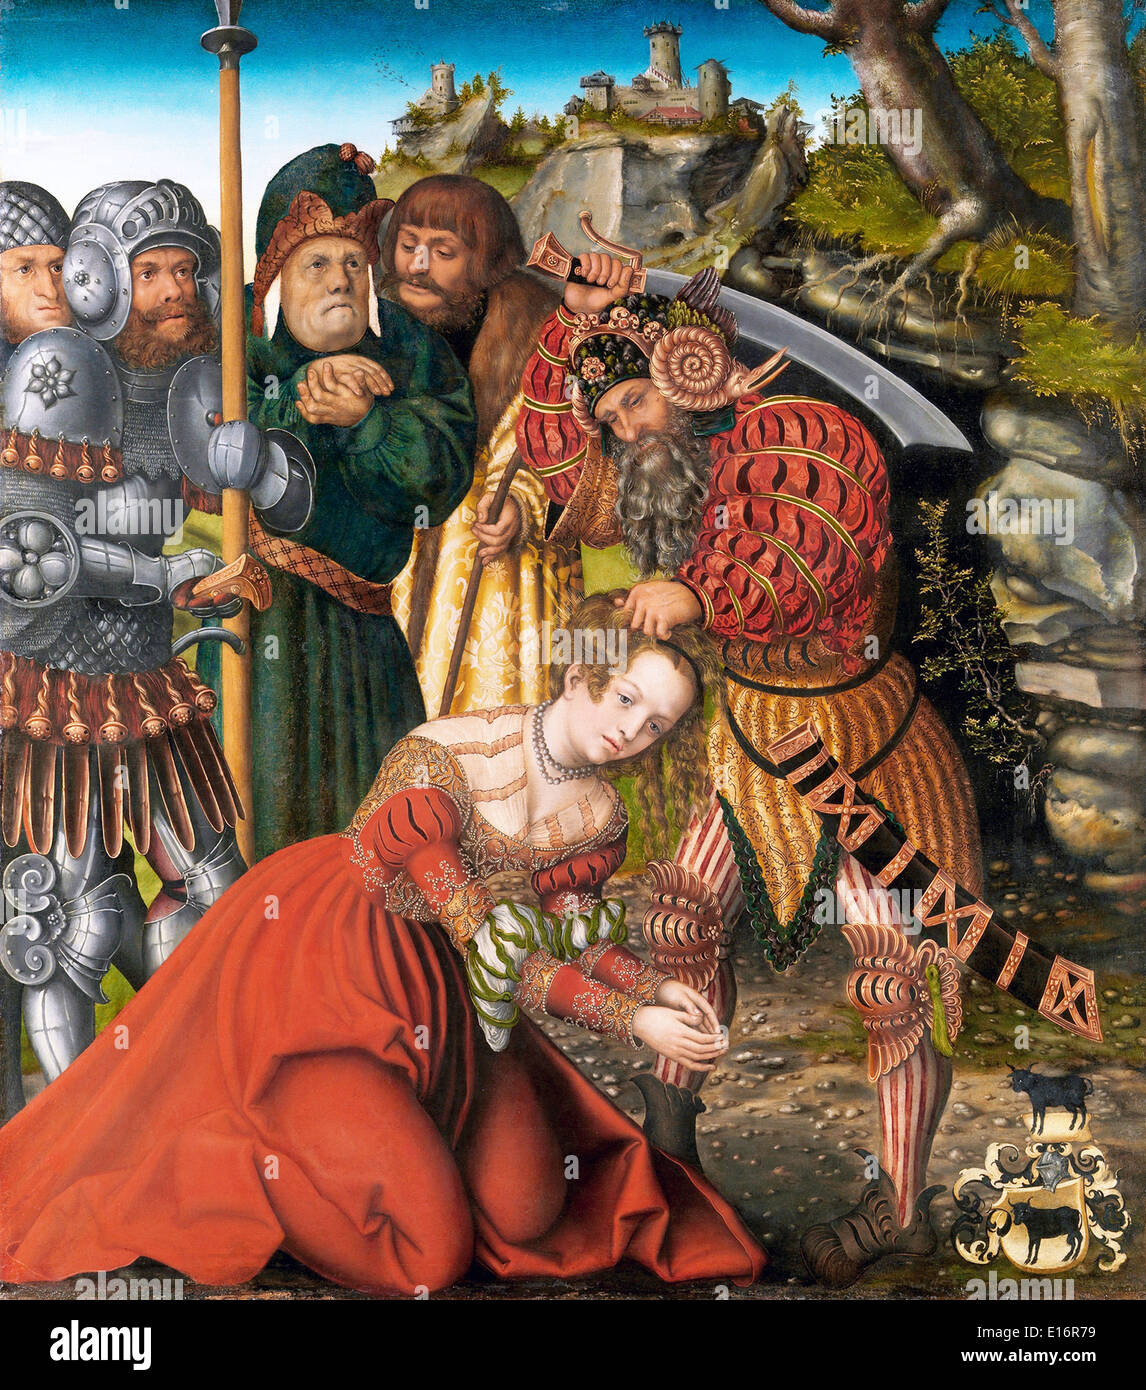 The Martyrdom of Saint Barbara by Lucas Cranach the Elder, 1510 - Stock Image